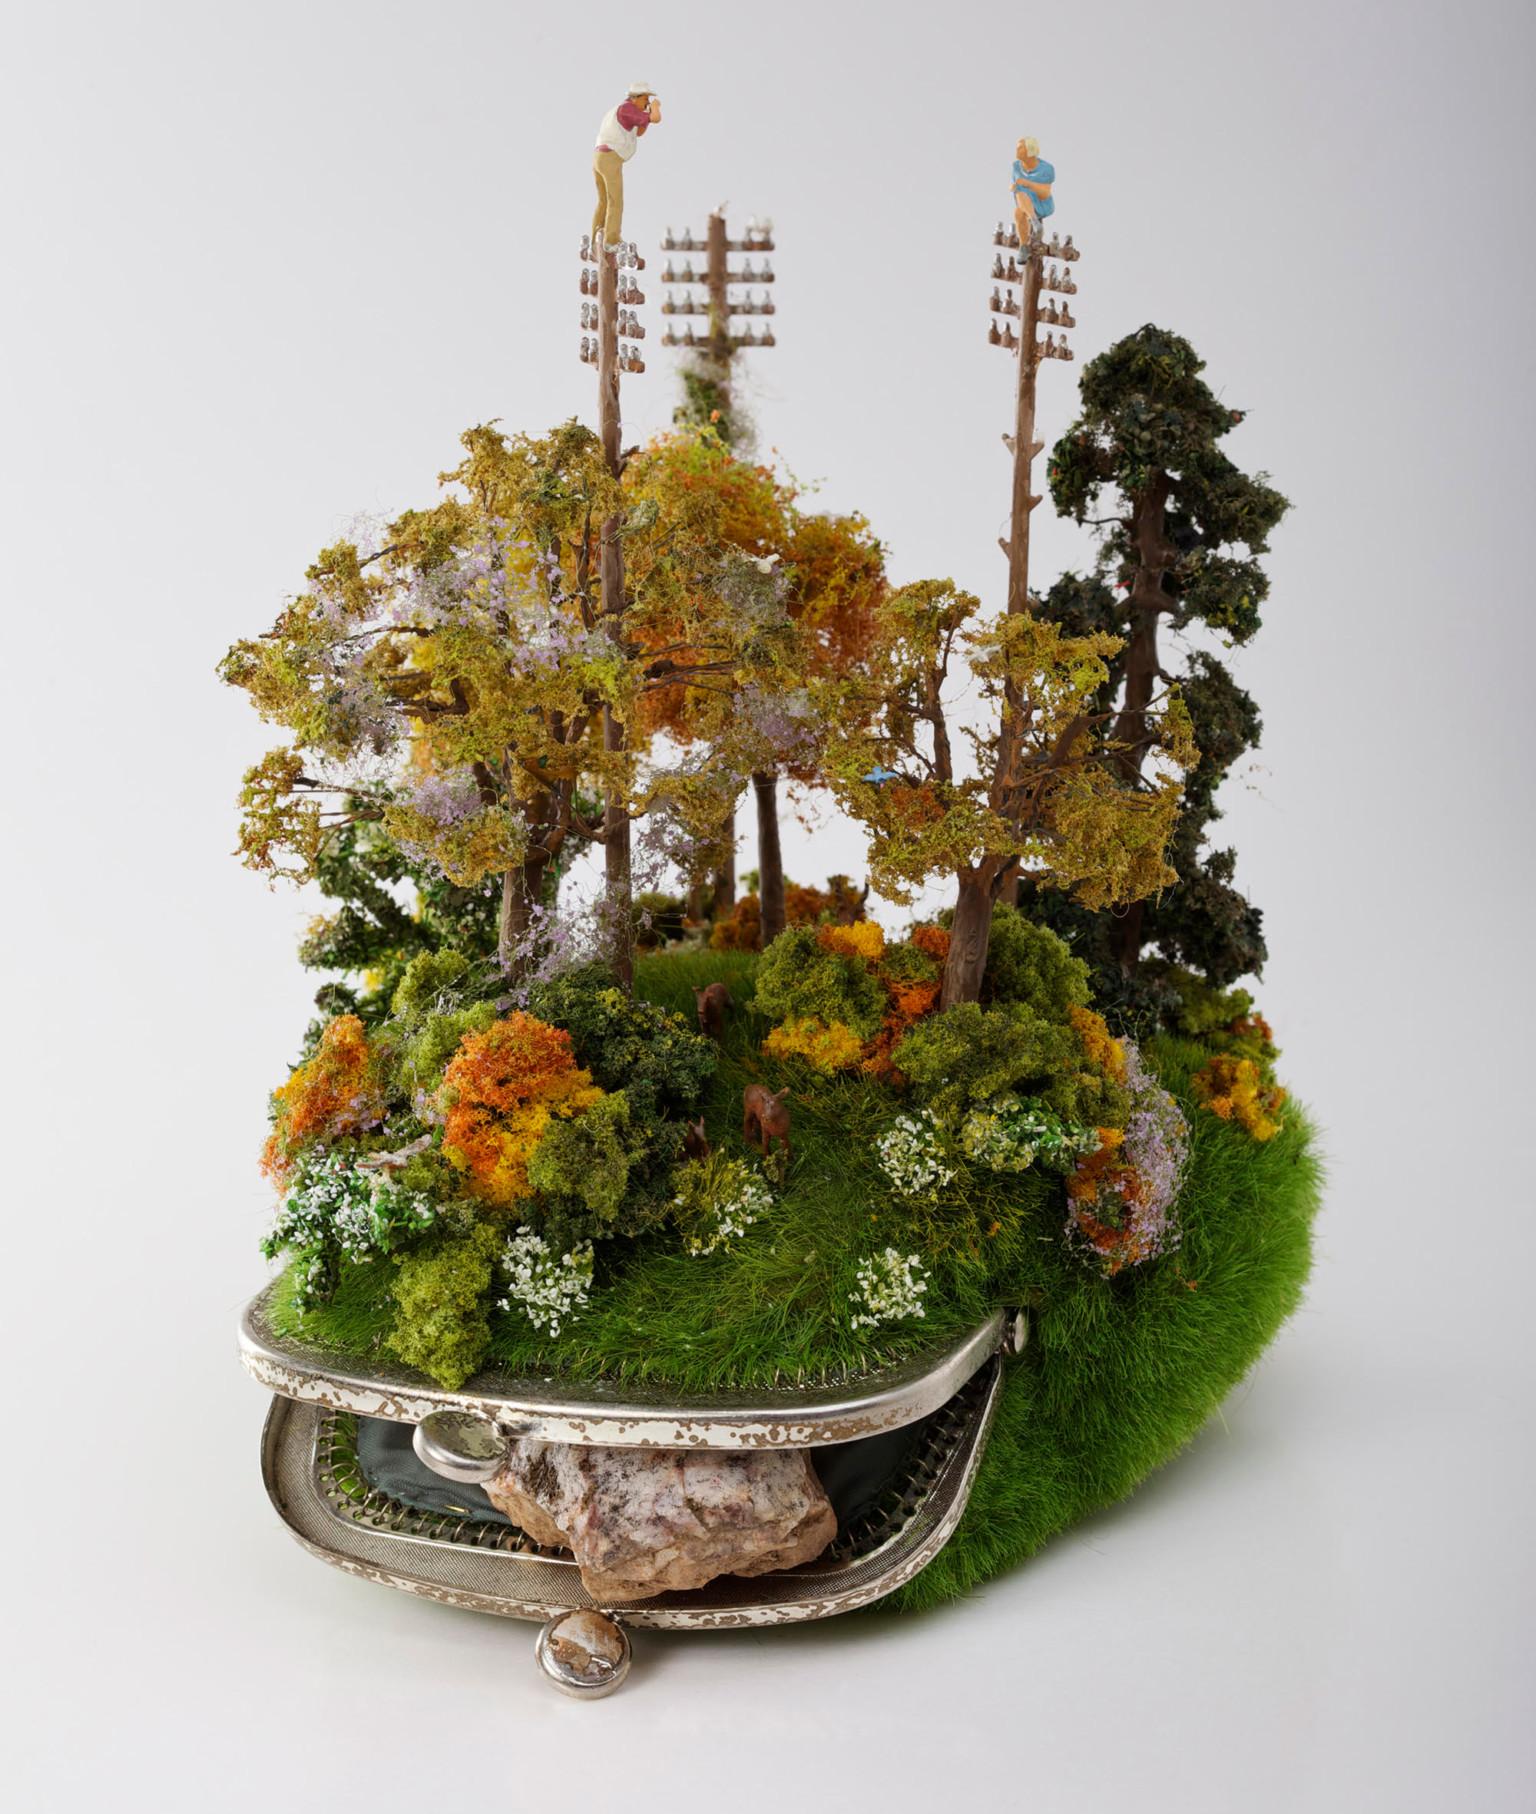 kendal-murray-miniatur-szobrai-noko-02.jpg